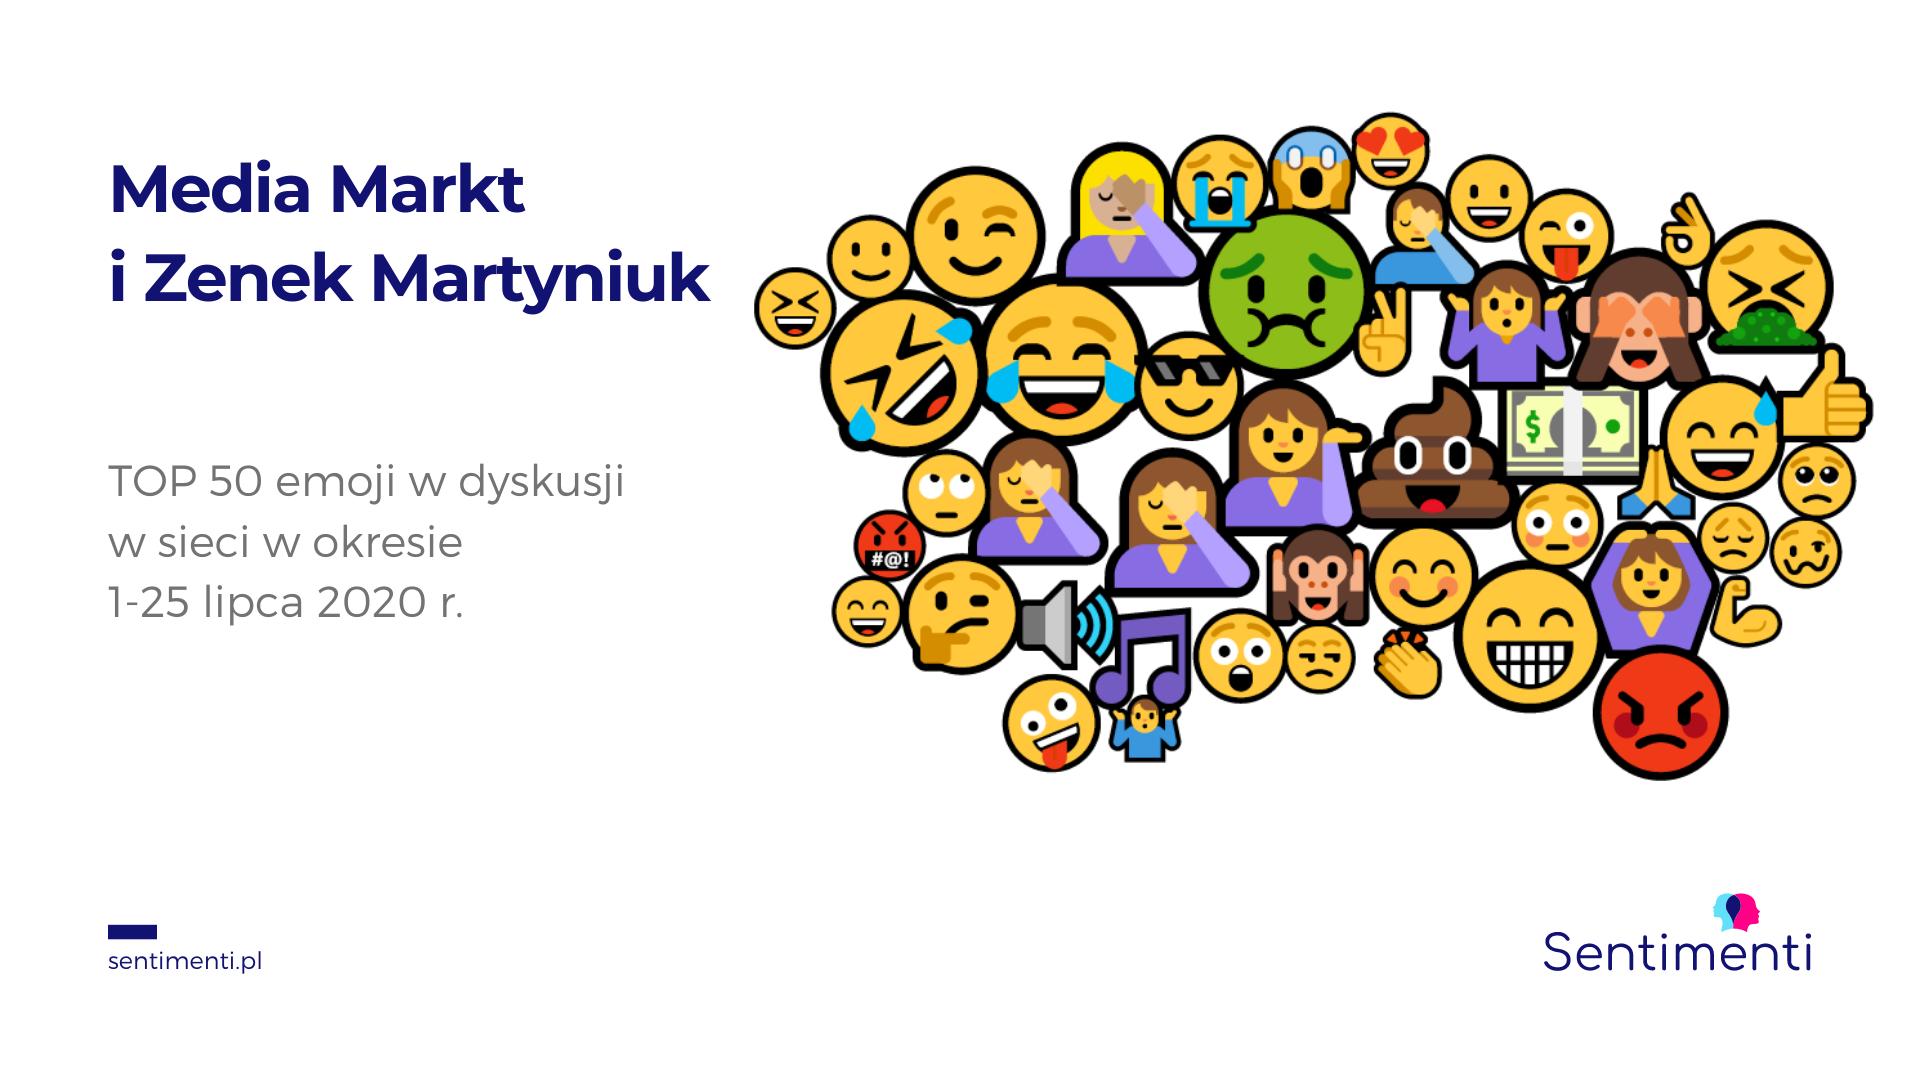 zenek martyniuk media markt sentimenti emoji reakcje monitoring social media akcent koncerty